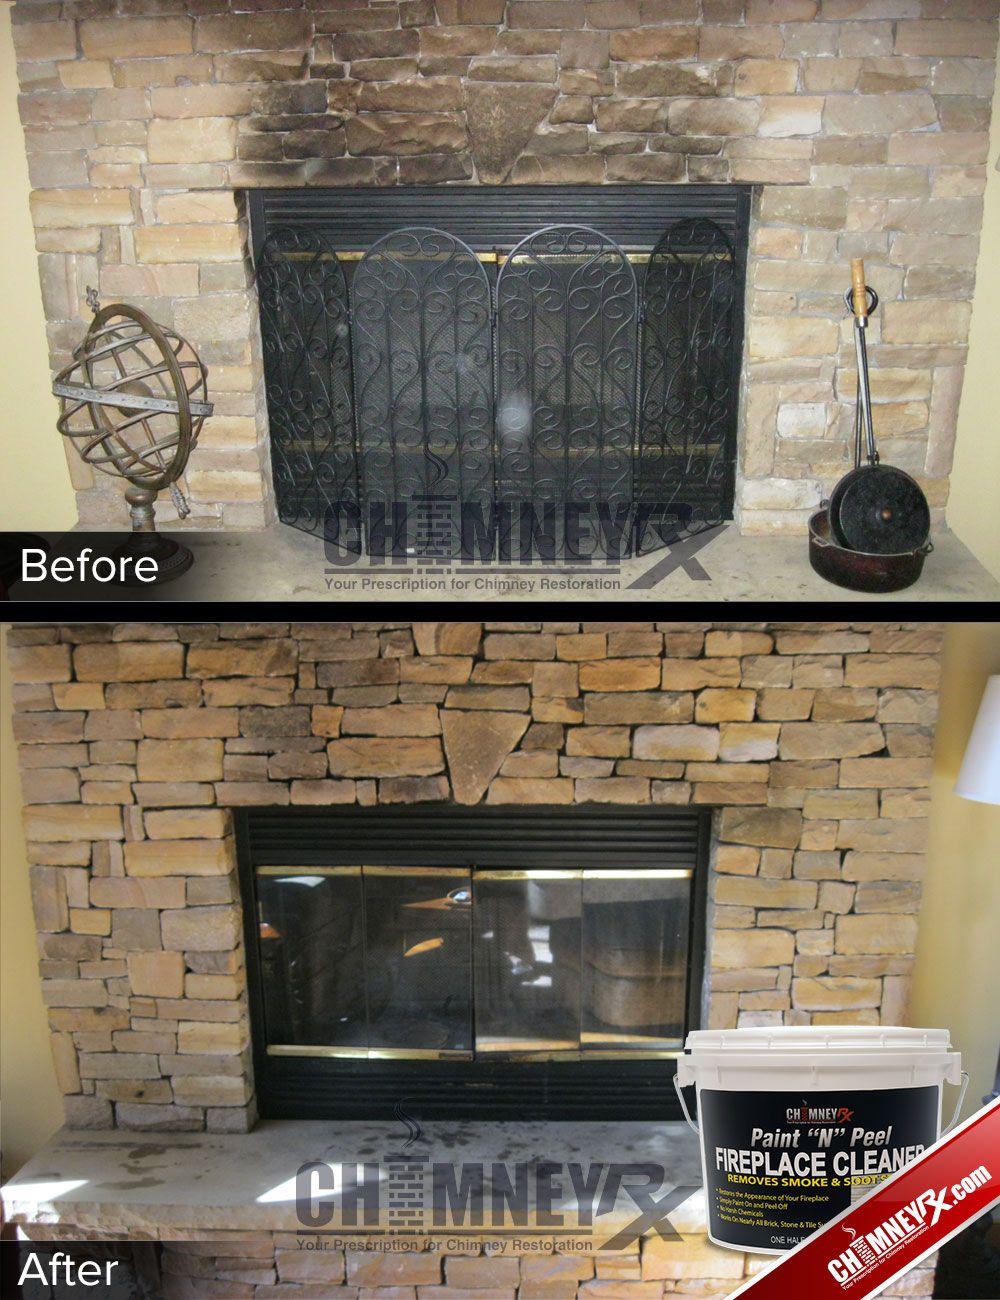 Home - ChimneyRX.com-Your Prescription to Chimney Restoration